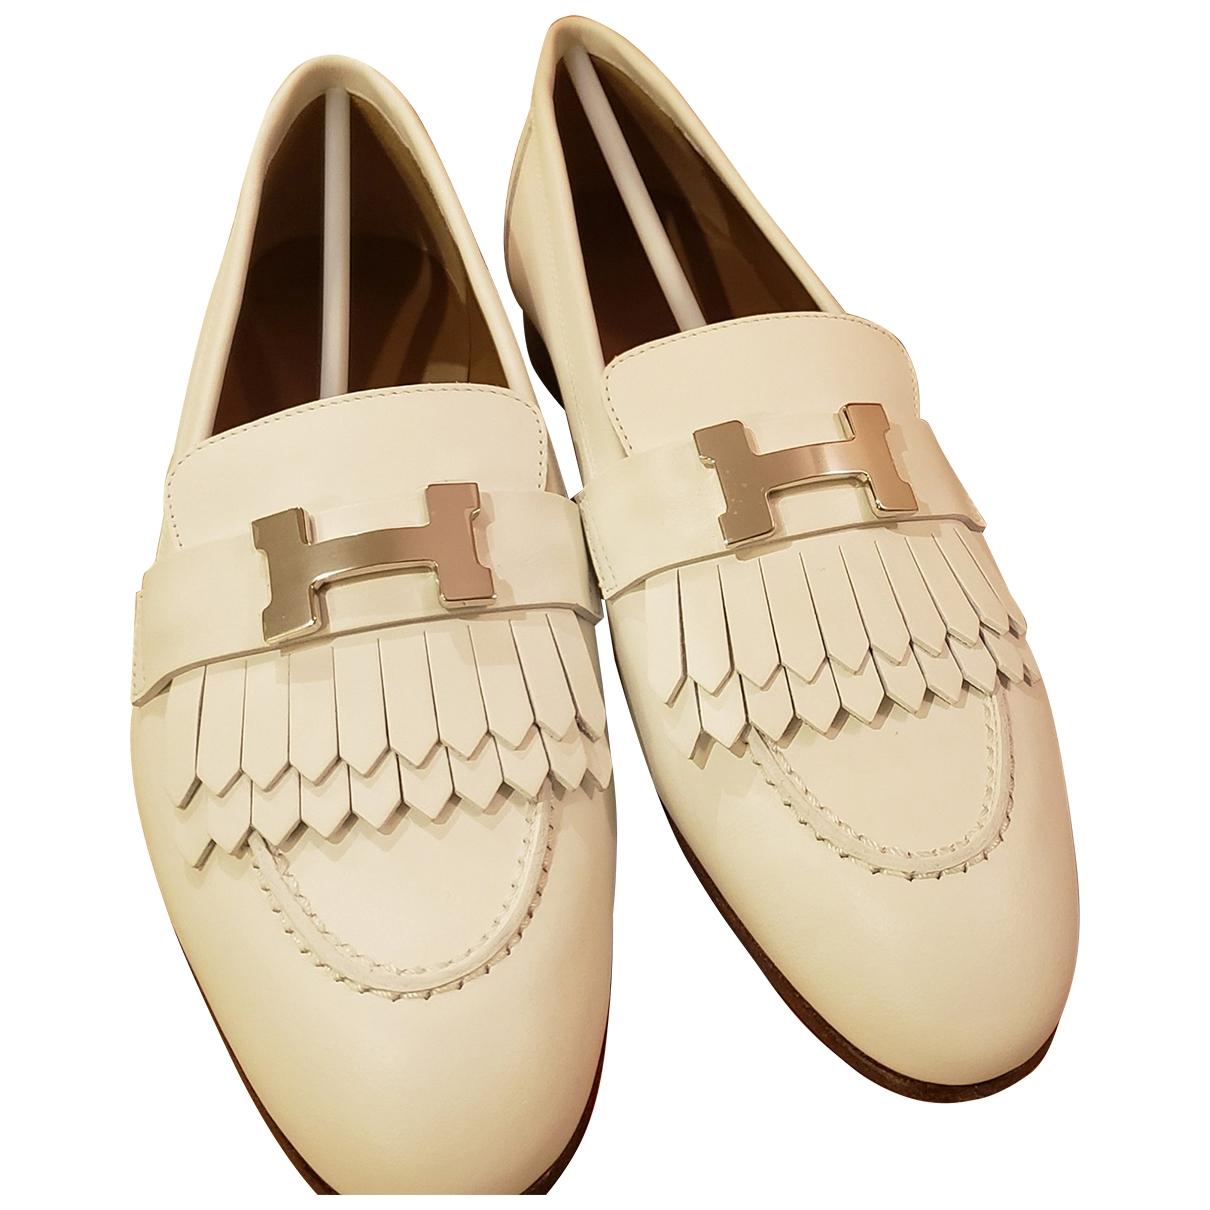 Hermès Paris White Leather Flats for Women 36 EU